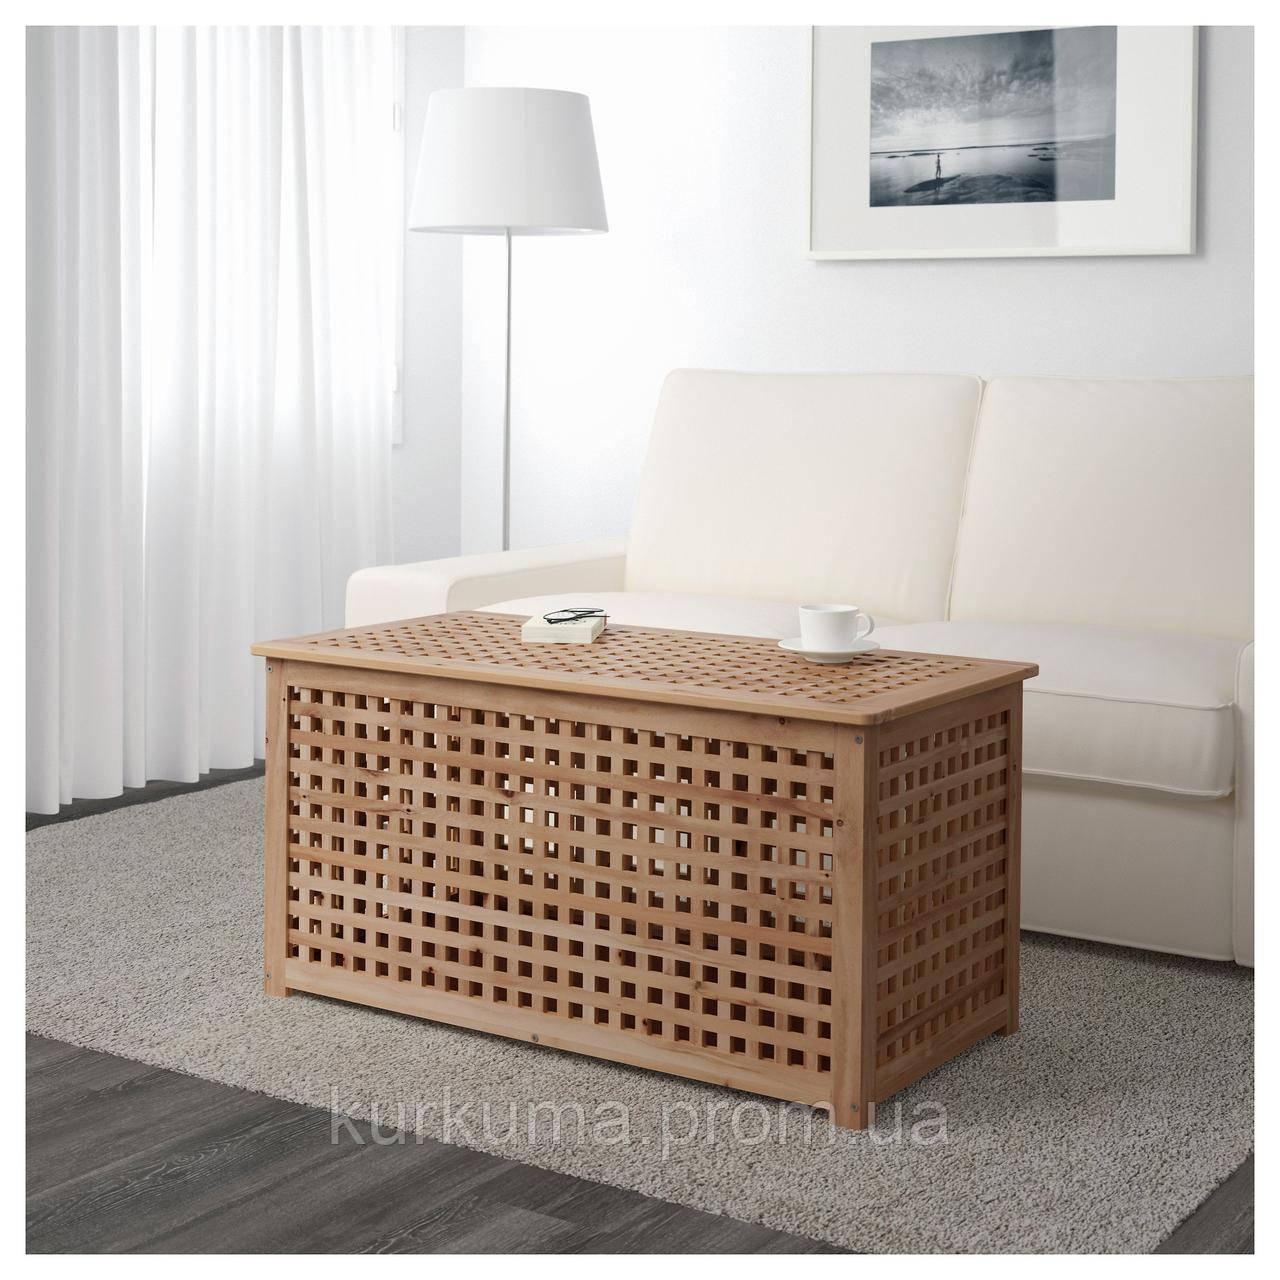 IKEA HOL Стол, Акация  (501.613.21)